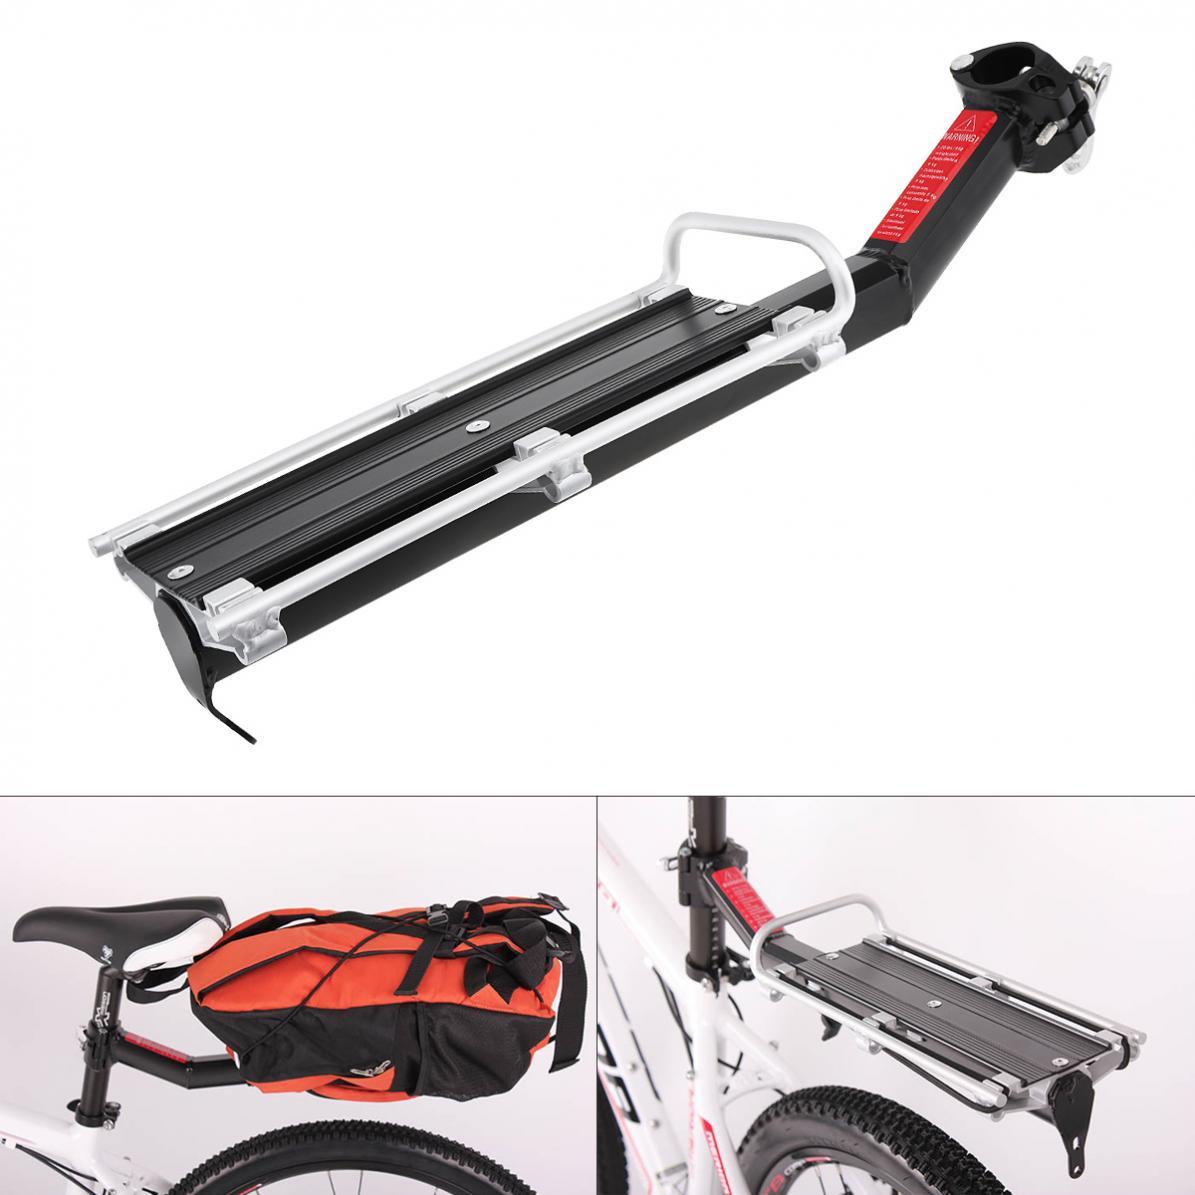 Zwarte Fiets Rack Aluminiumlegering Bagage Bagagedrager Kofferbak Voor Fietsen Mtb Bike Achter Plank Fiets Rekken